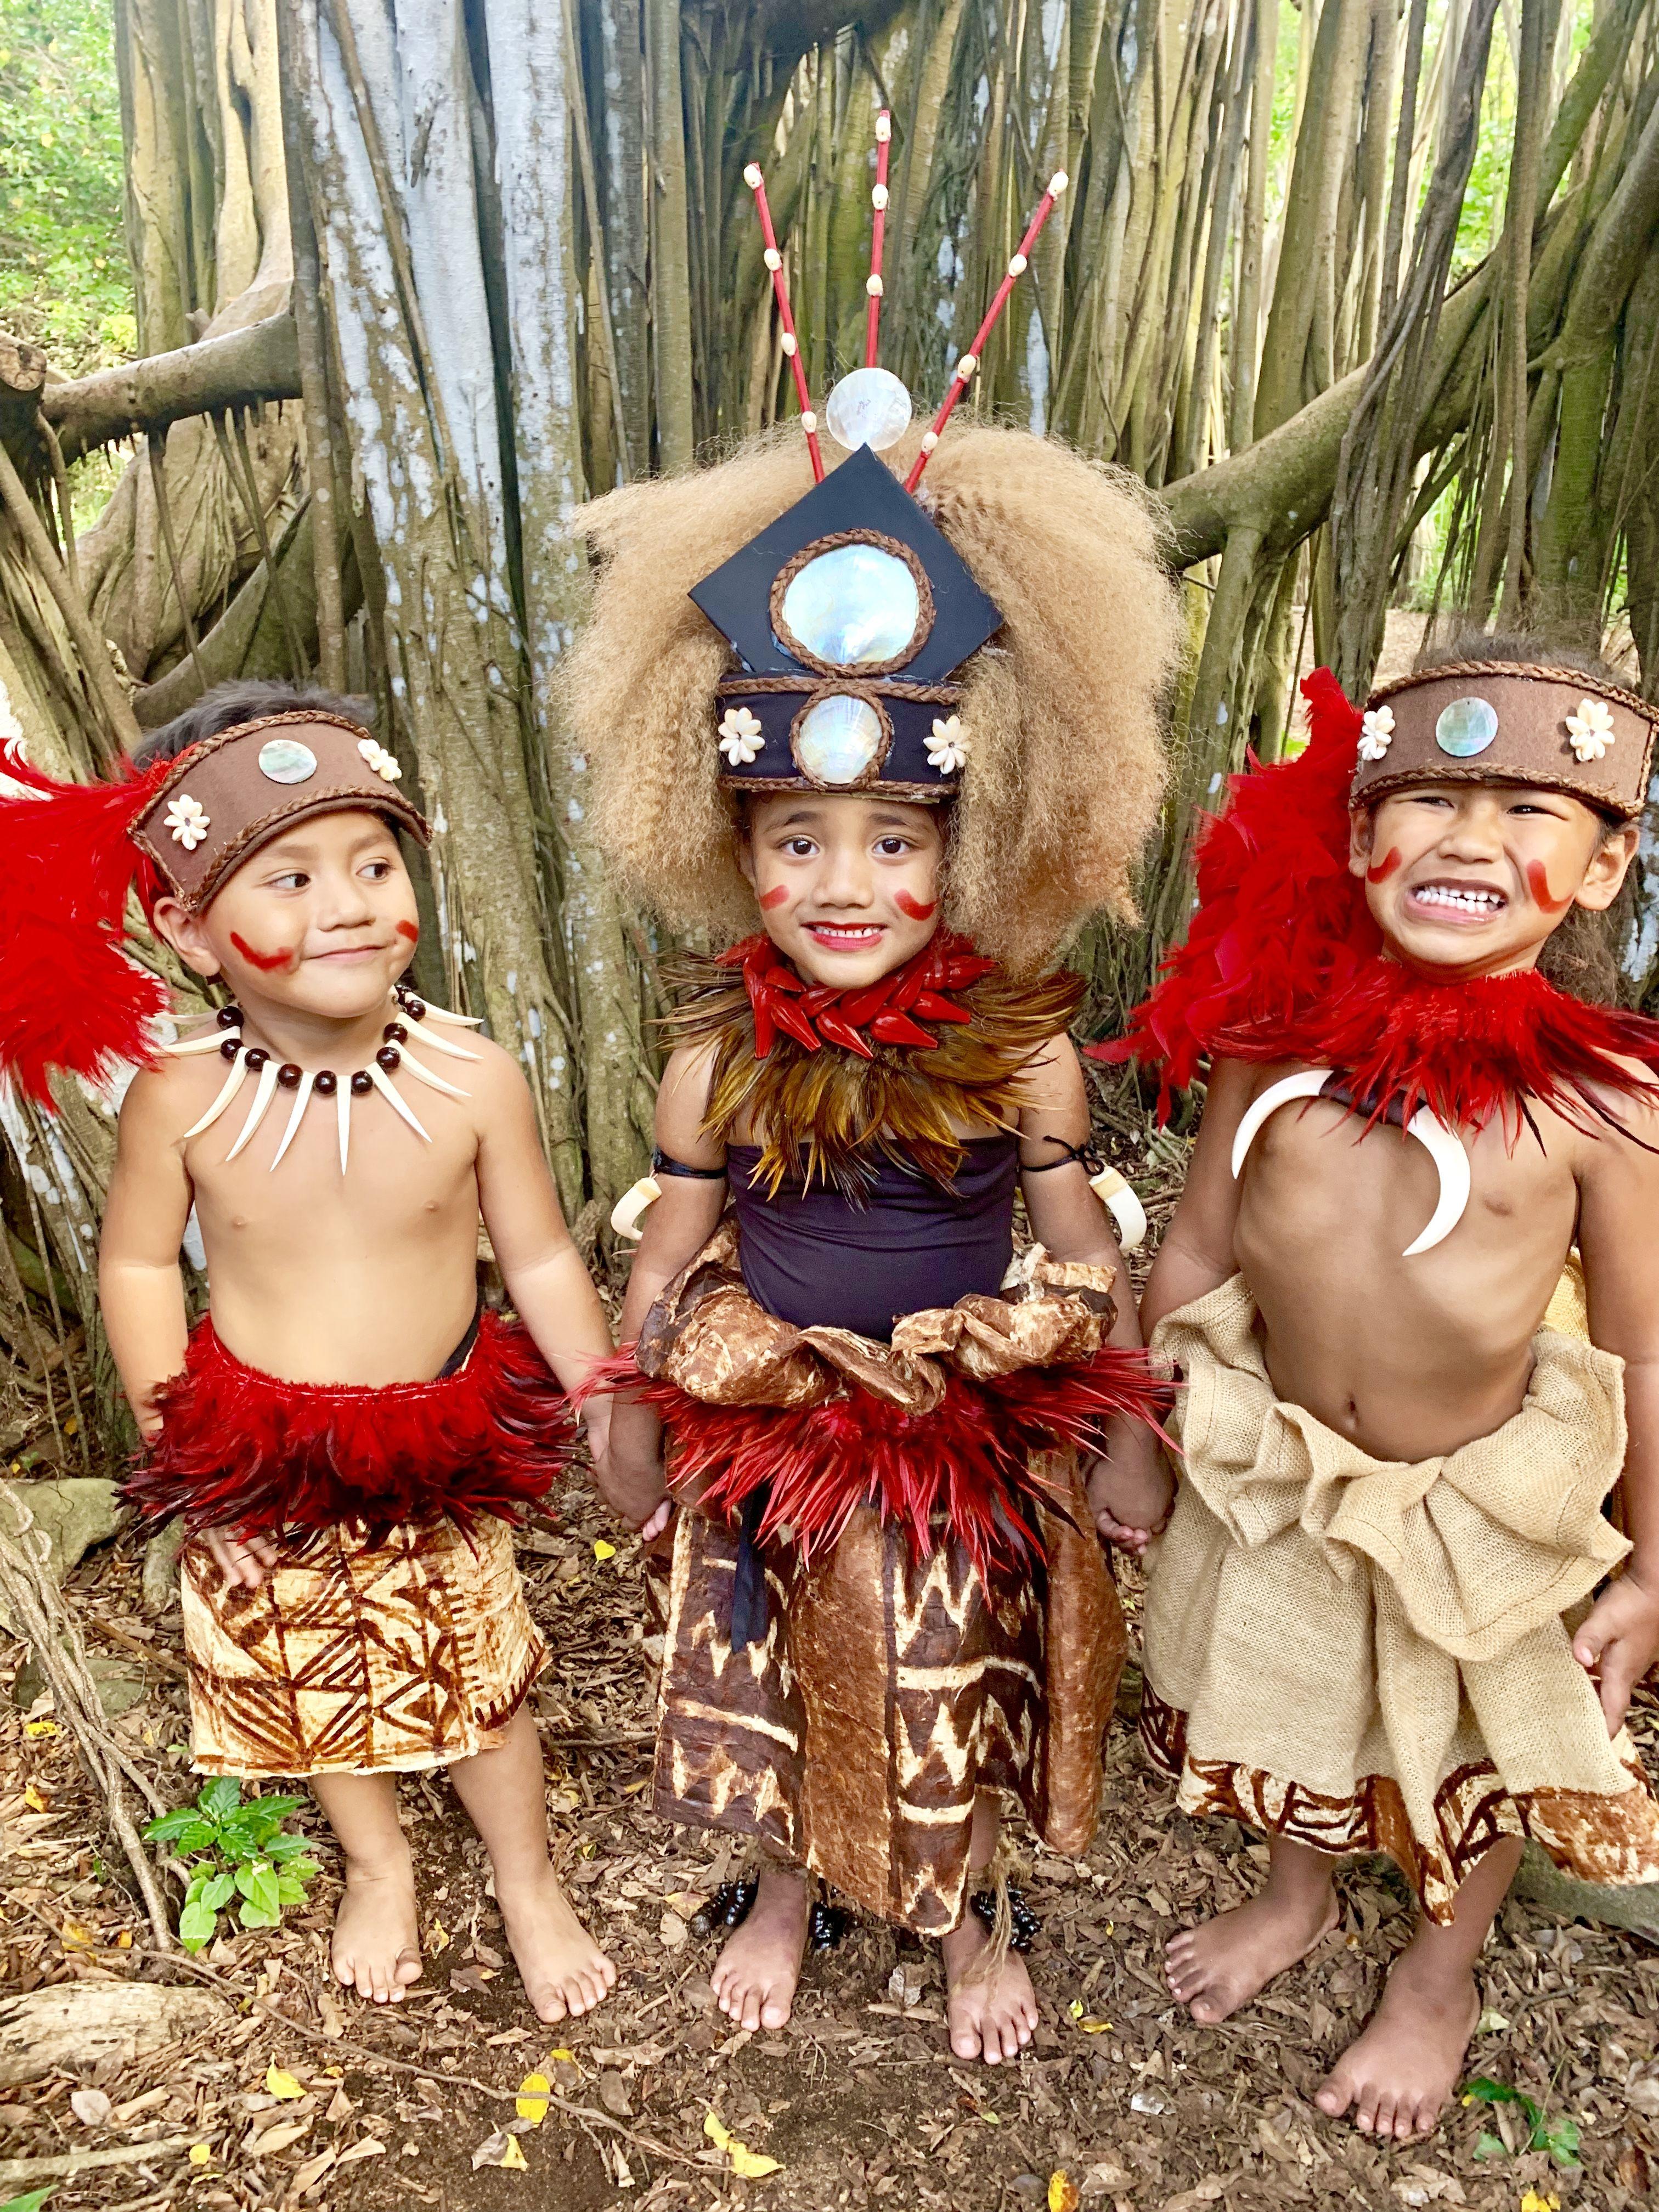 Culture Wear Samoan Designs Polynesian Dress Samoan Clothing